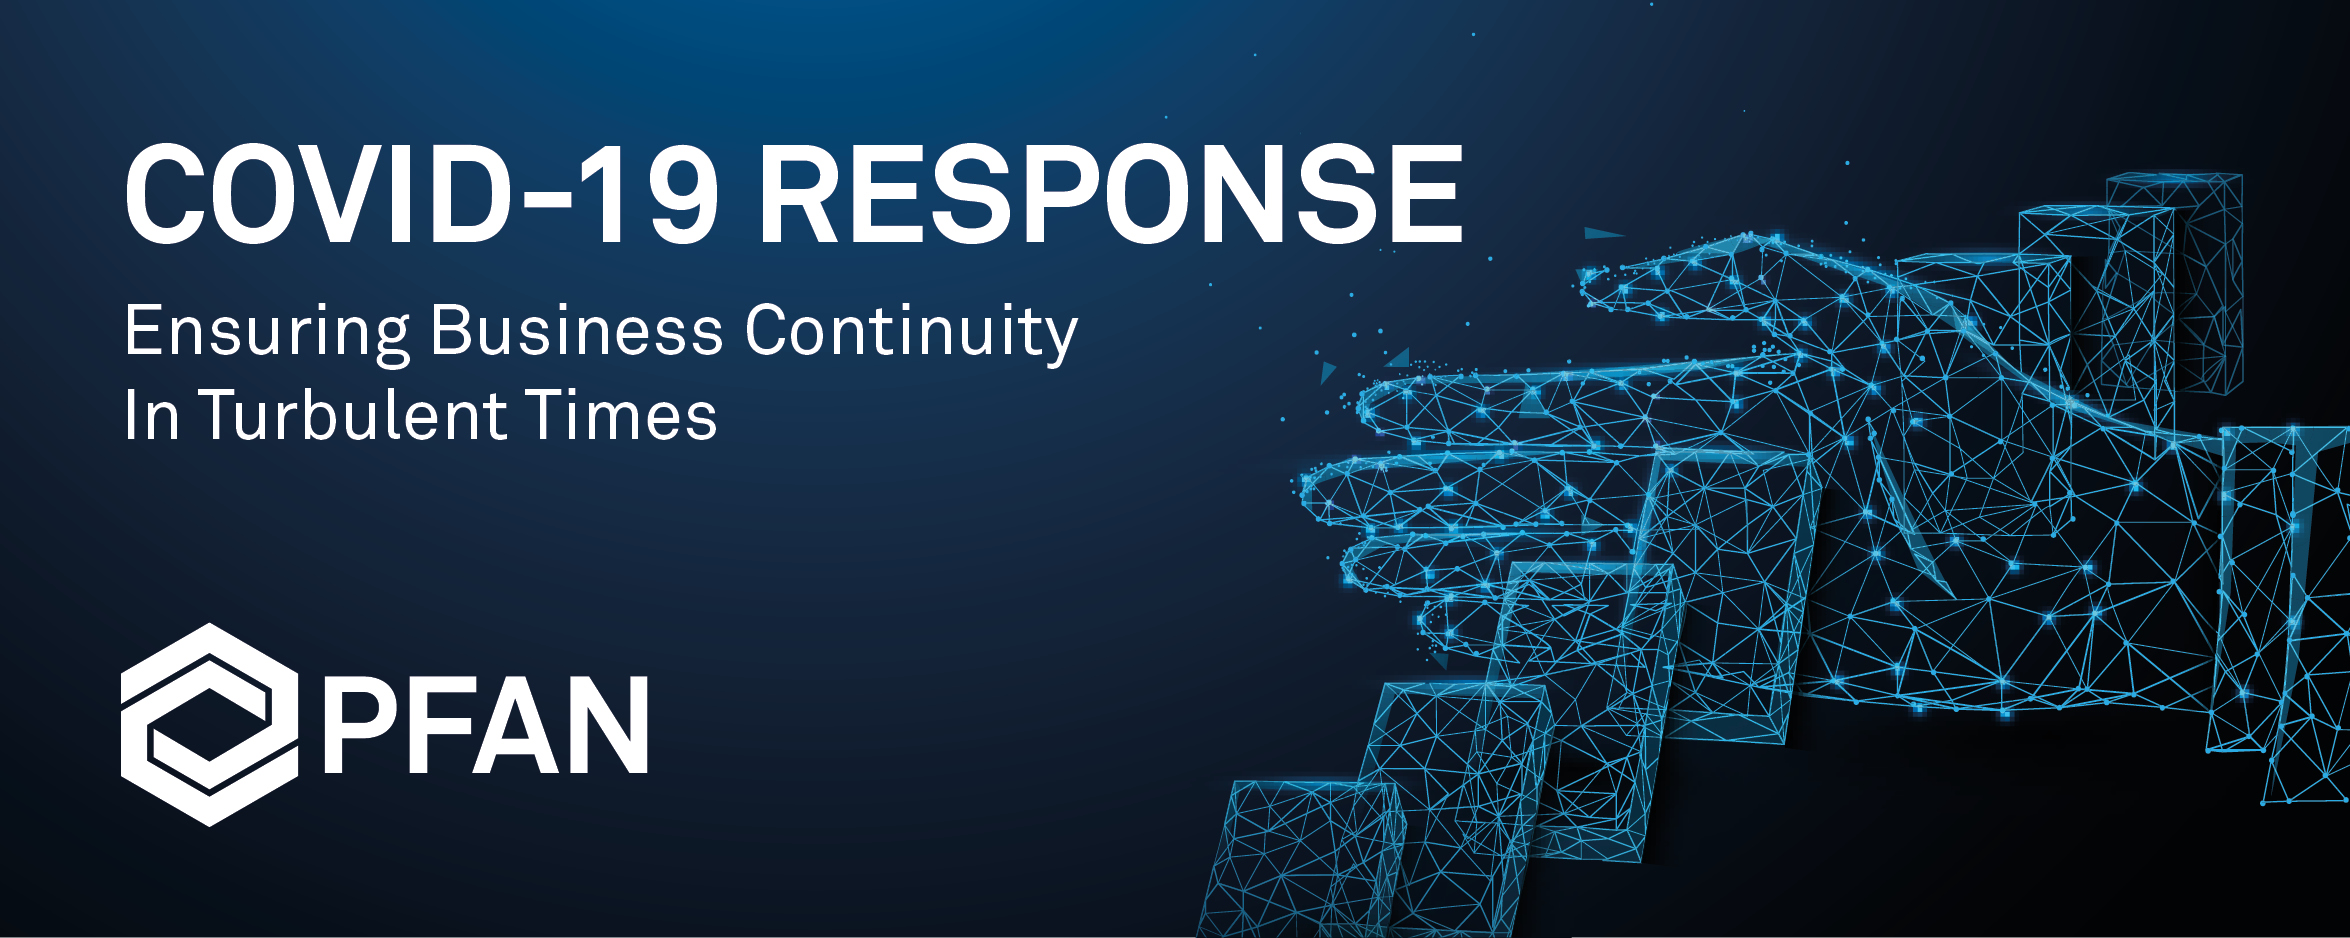 PFAN's Covid-19 Response